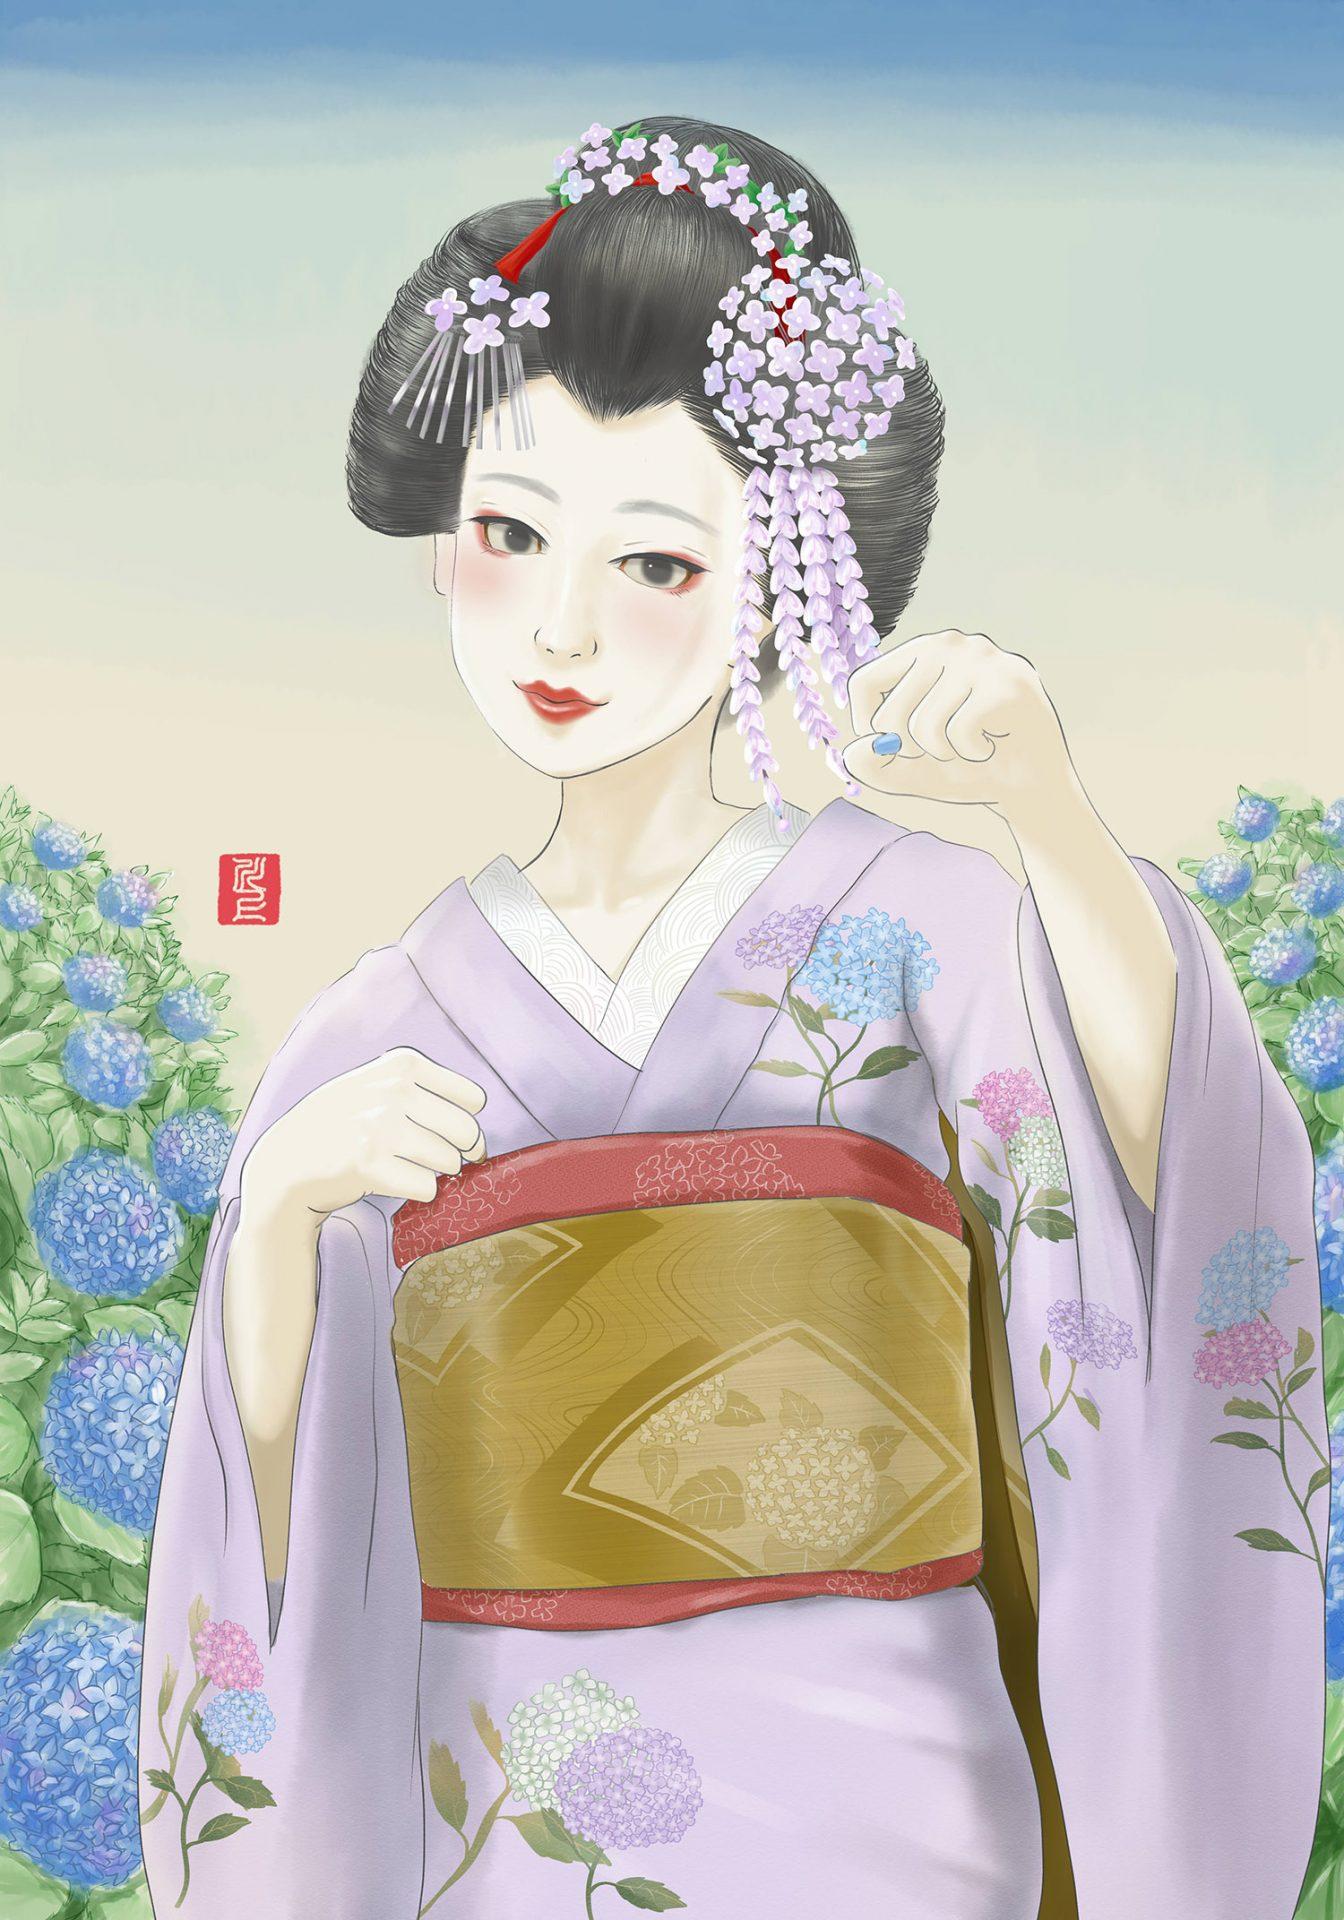 maikoart 芸者 舞妓 舞妓アート kawakamitetsuya 紫陽花 hydrangea